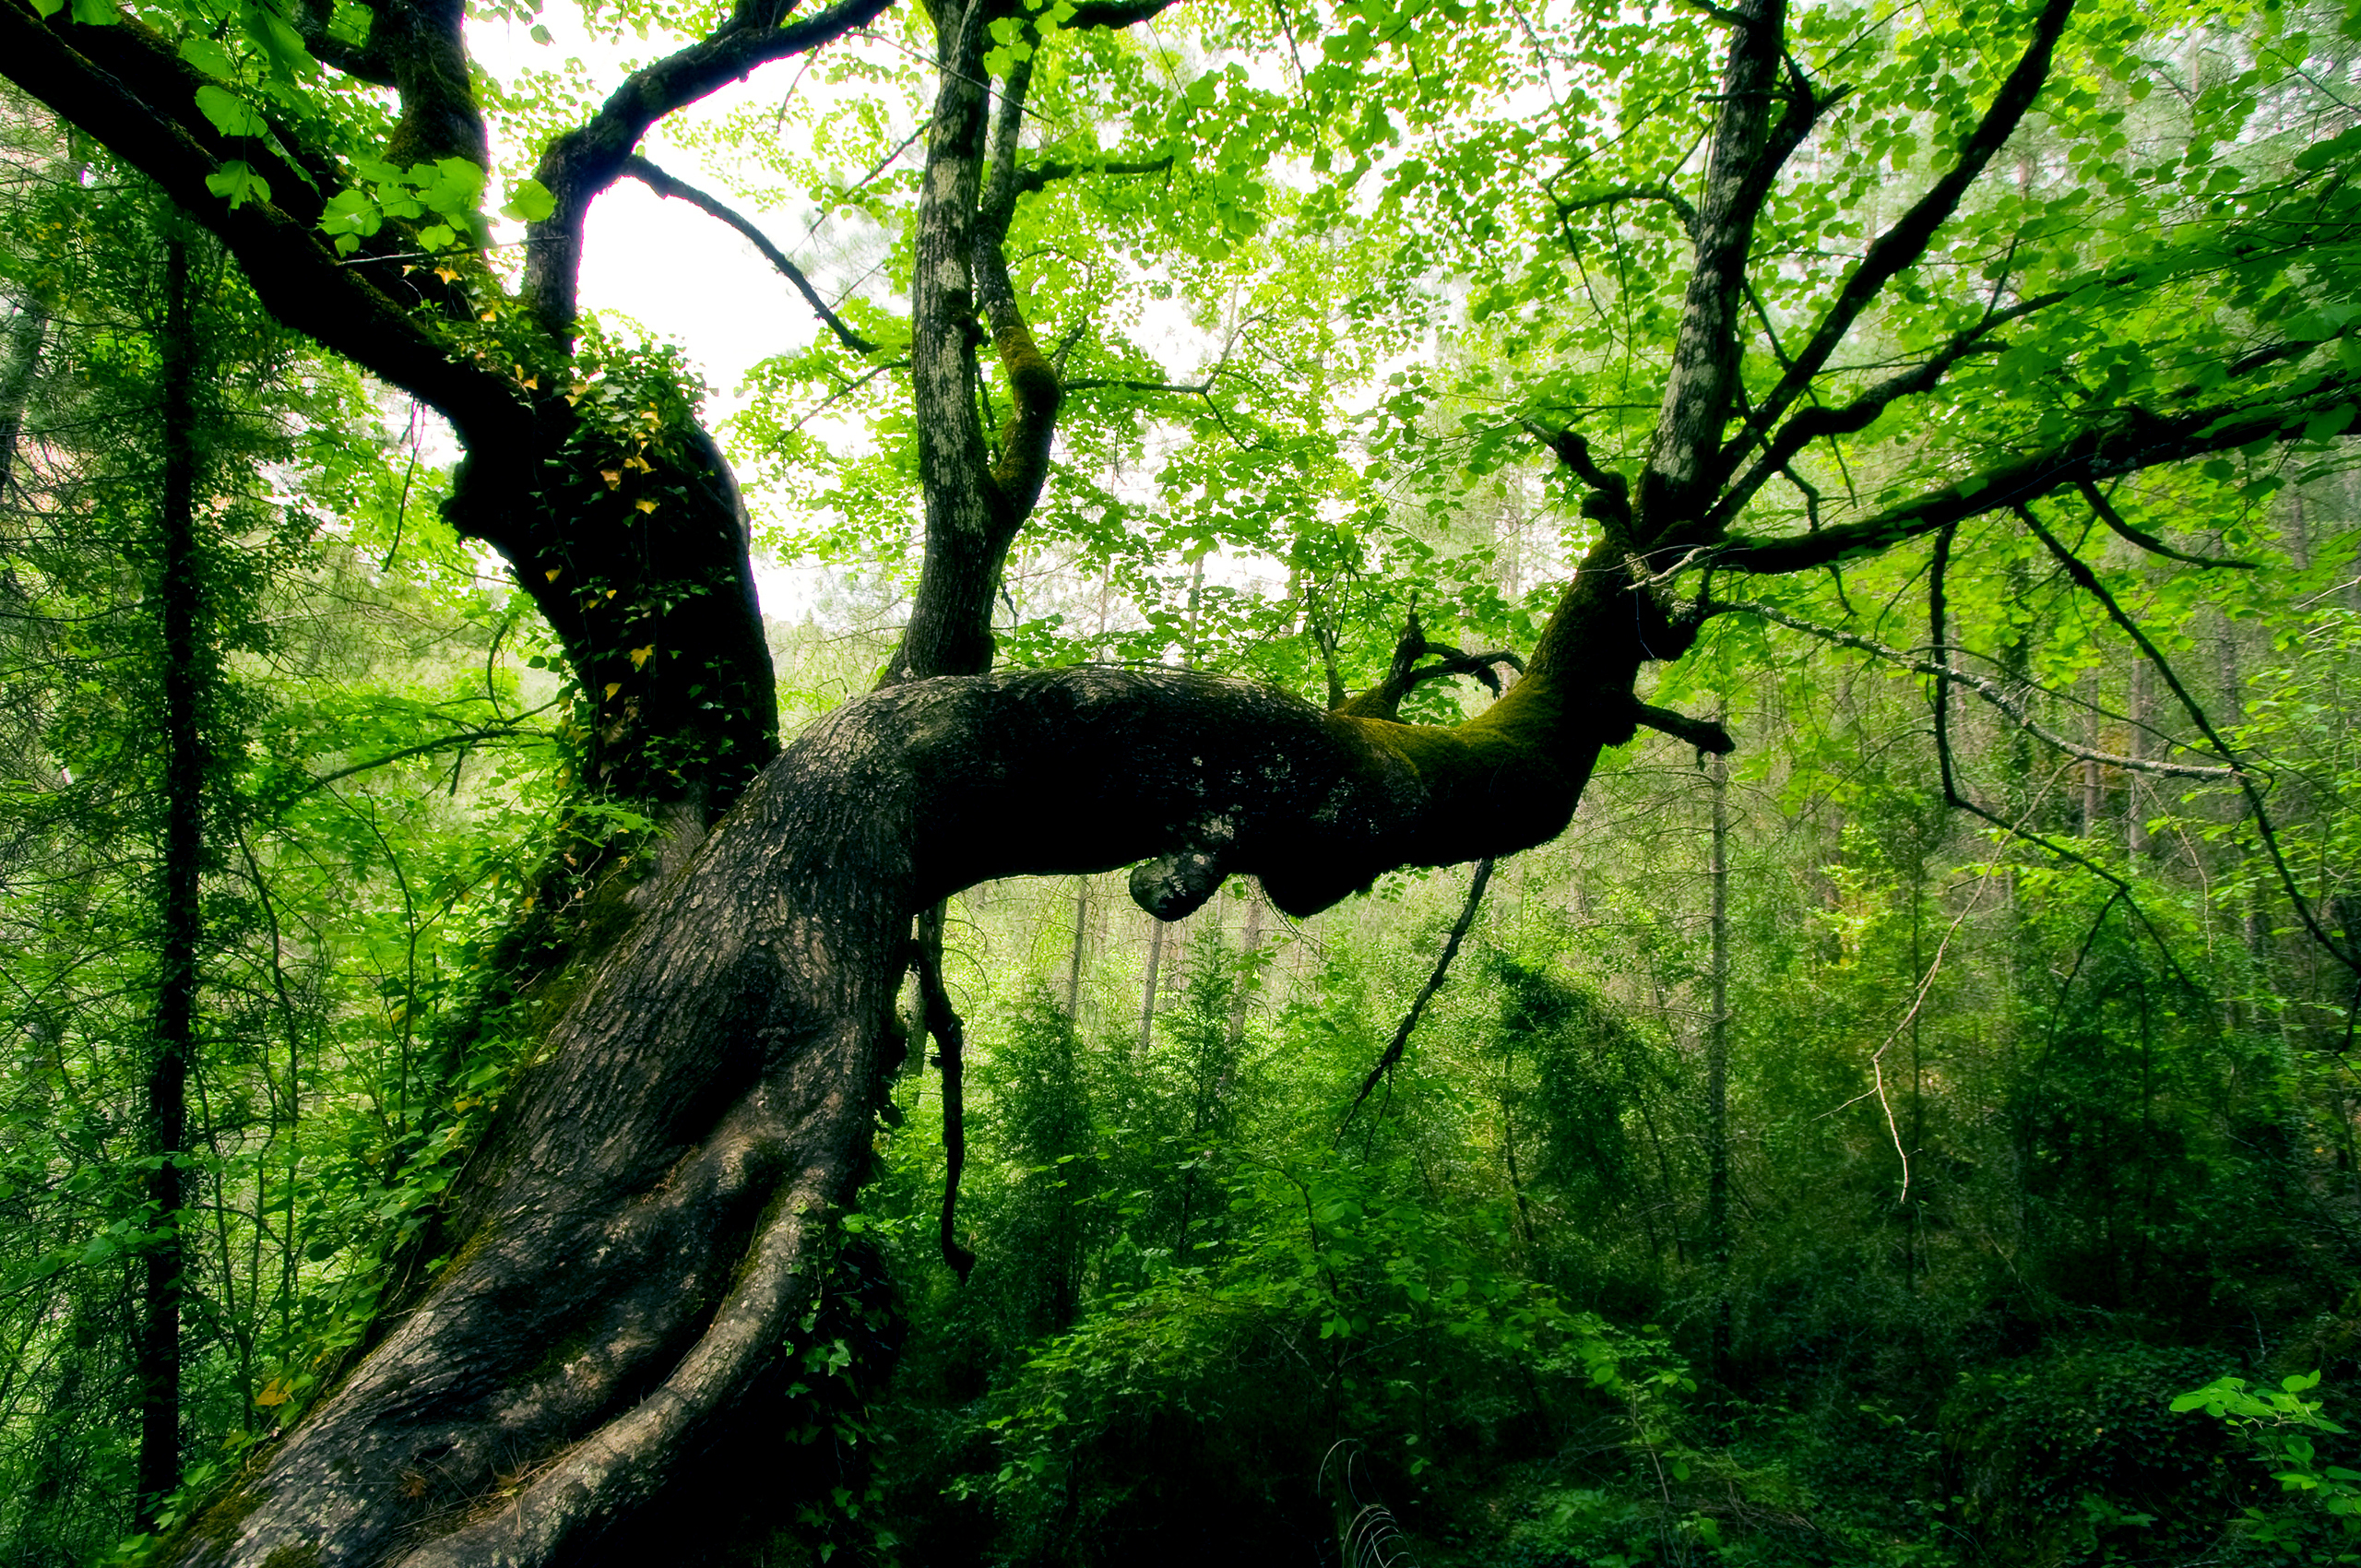 Nagaland jungal x desi movi pics sex pictures